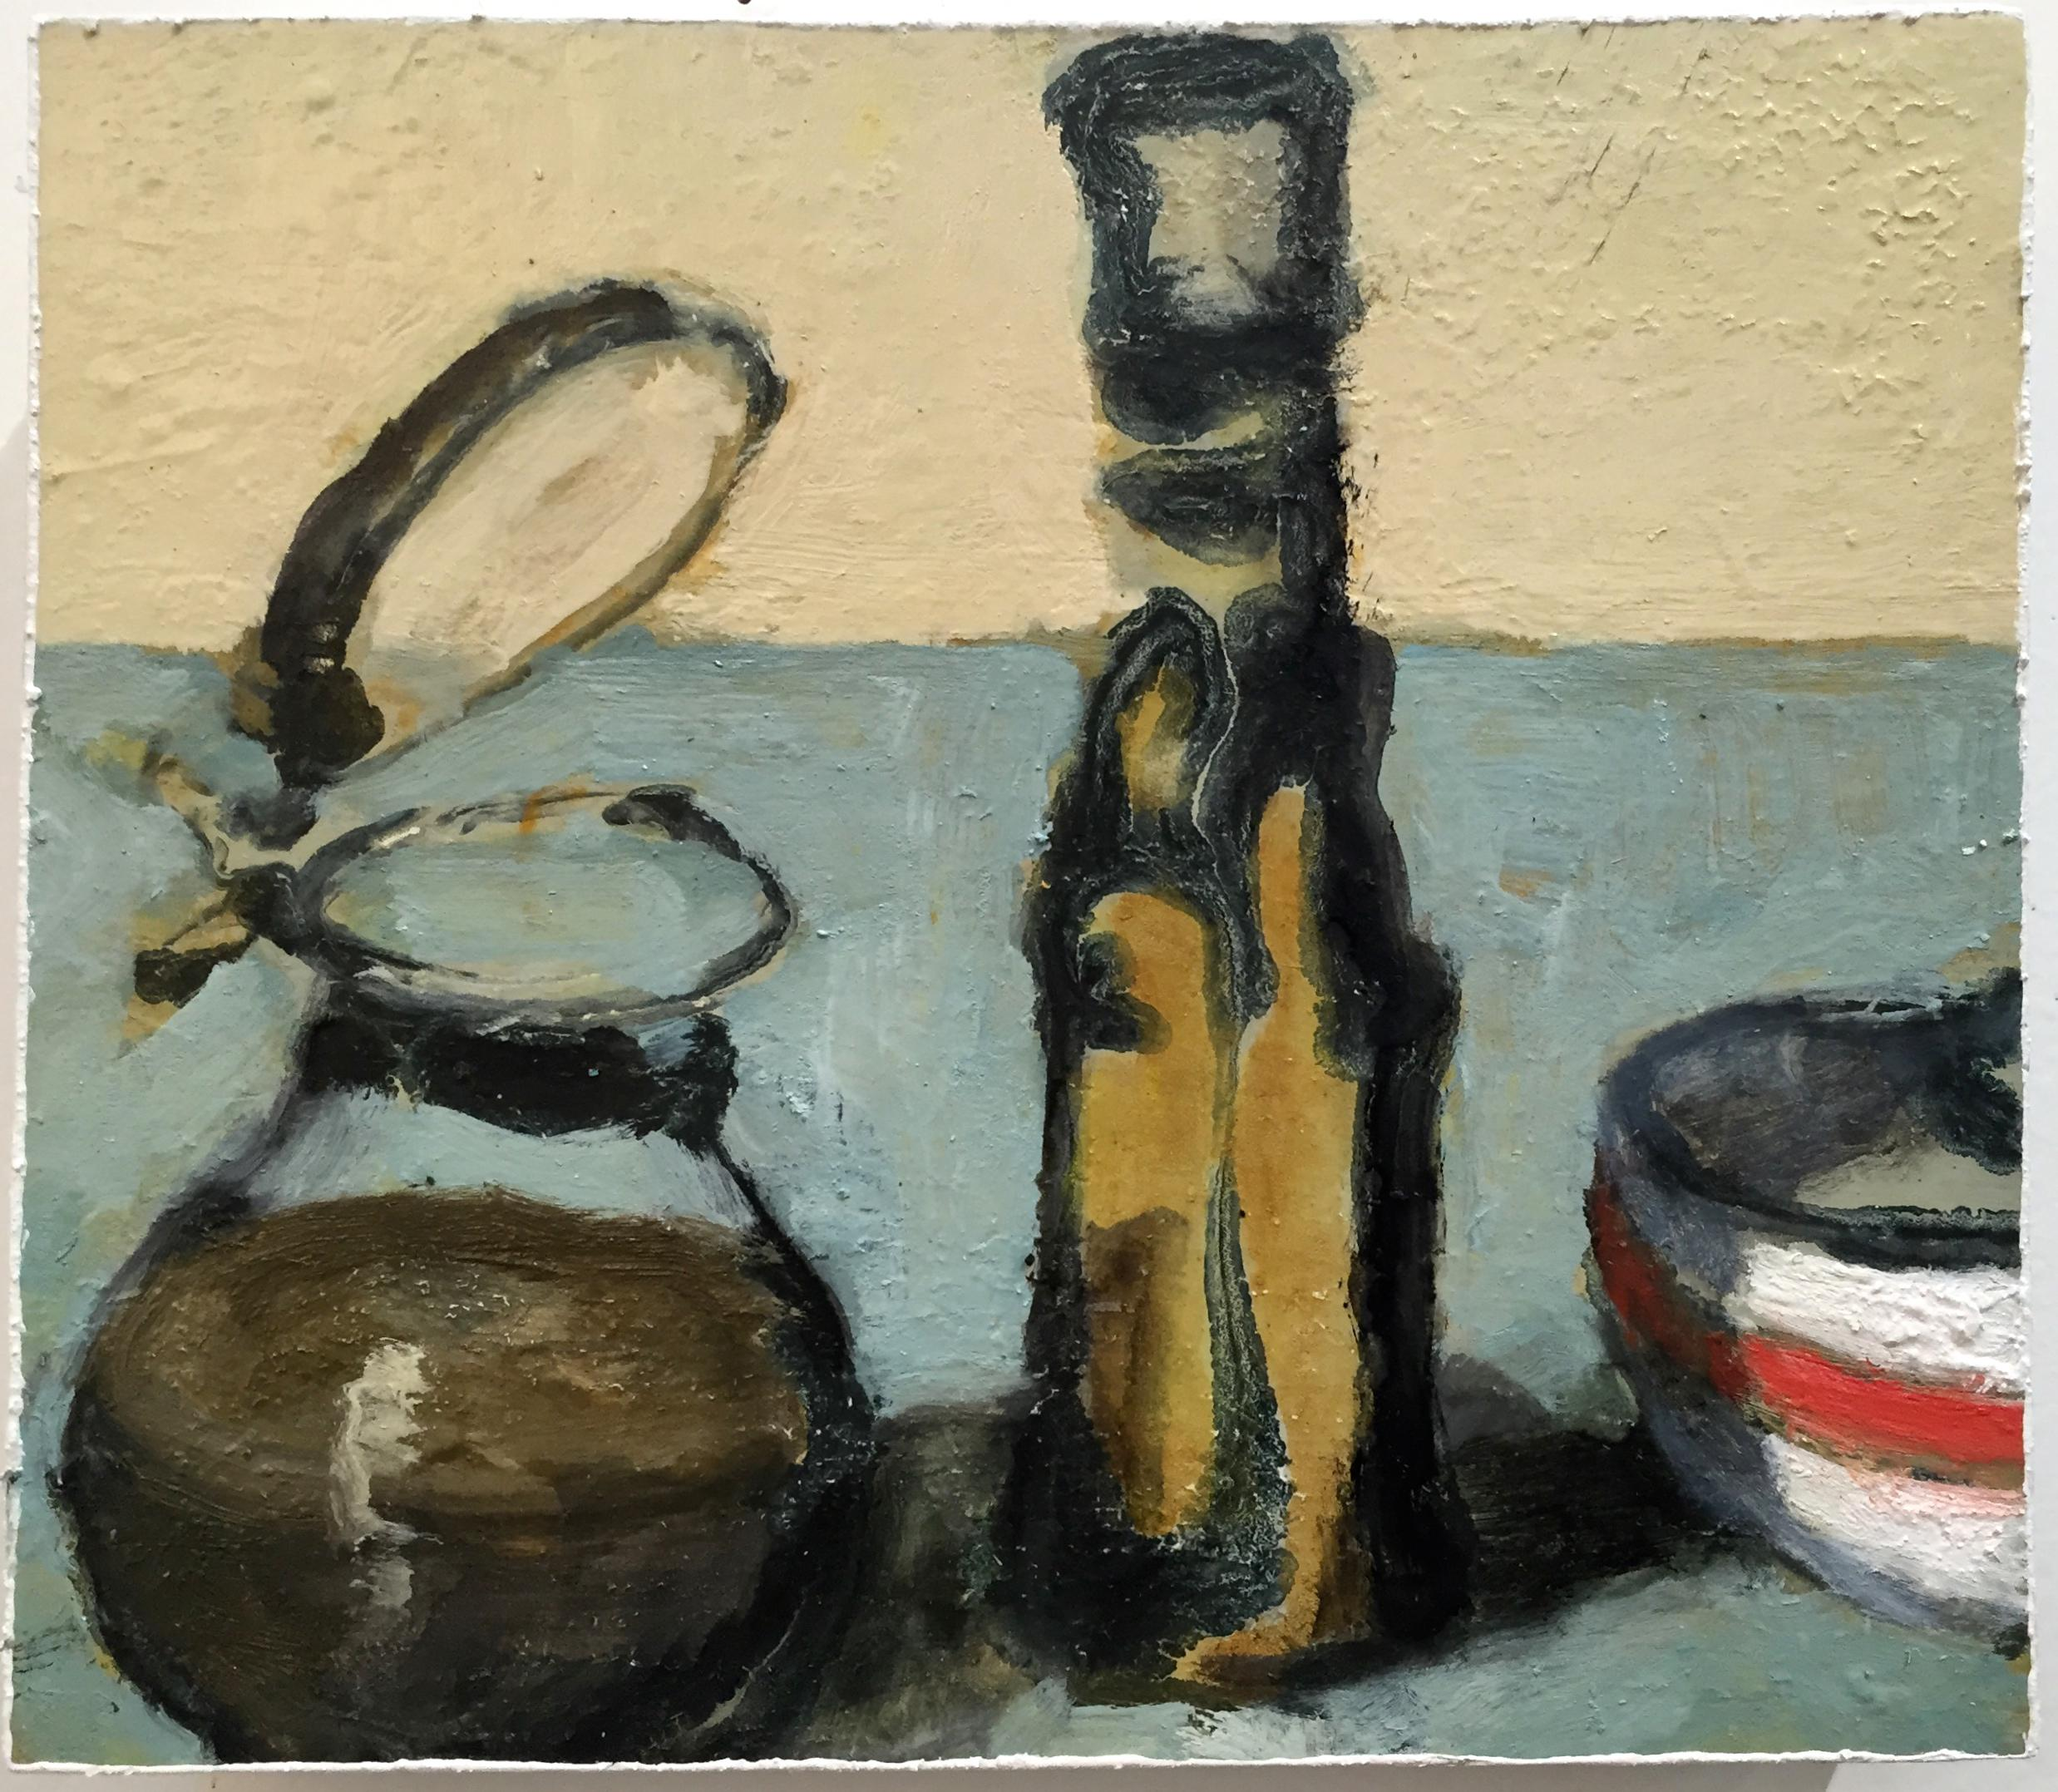 Countertop Vessels #2 (Charming Contemporary Still Life of Olive Oil Cruet)